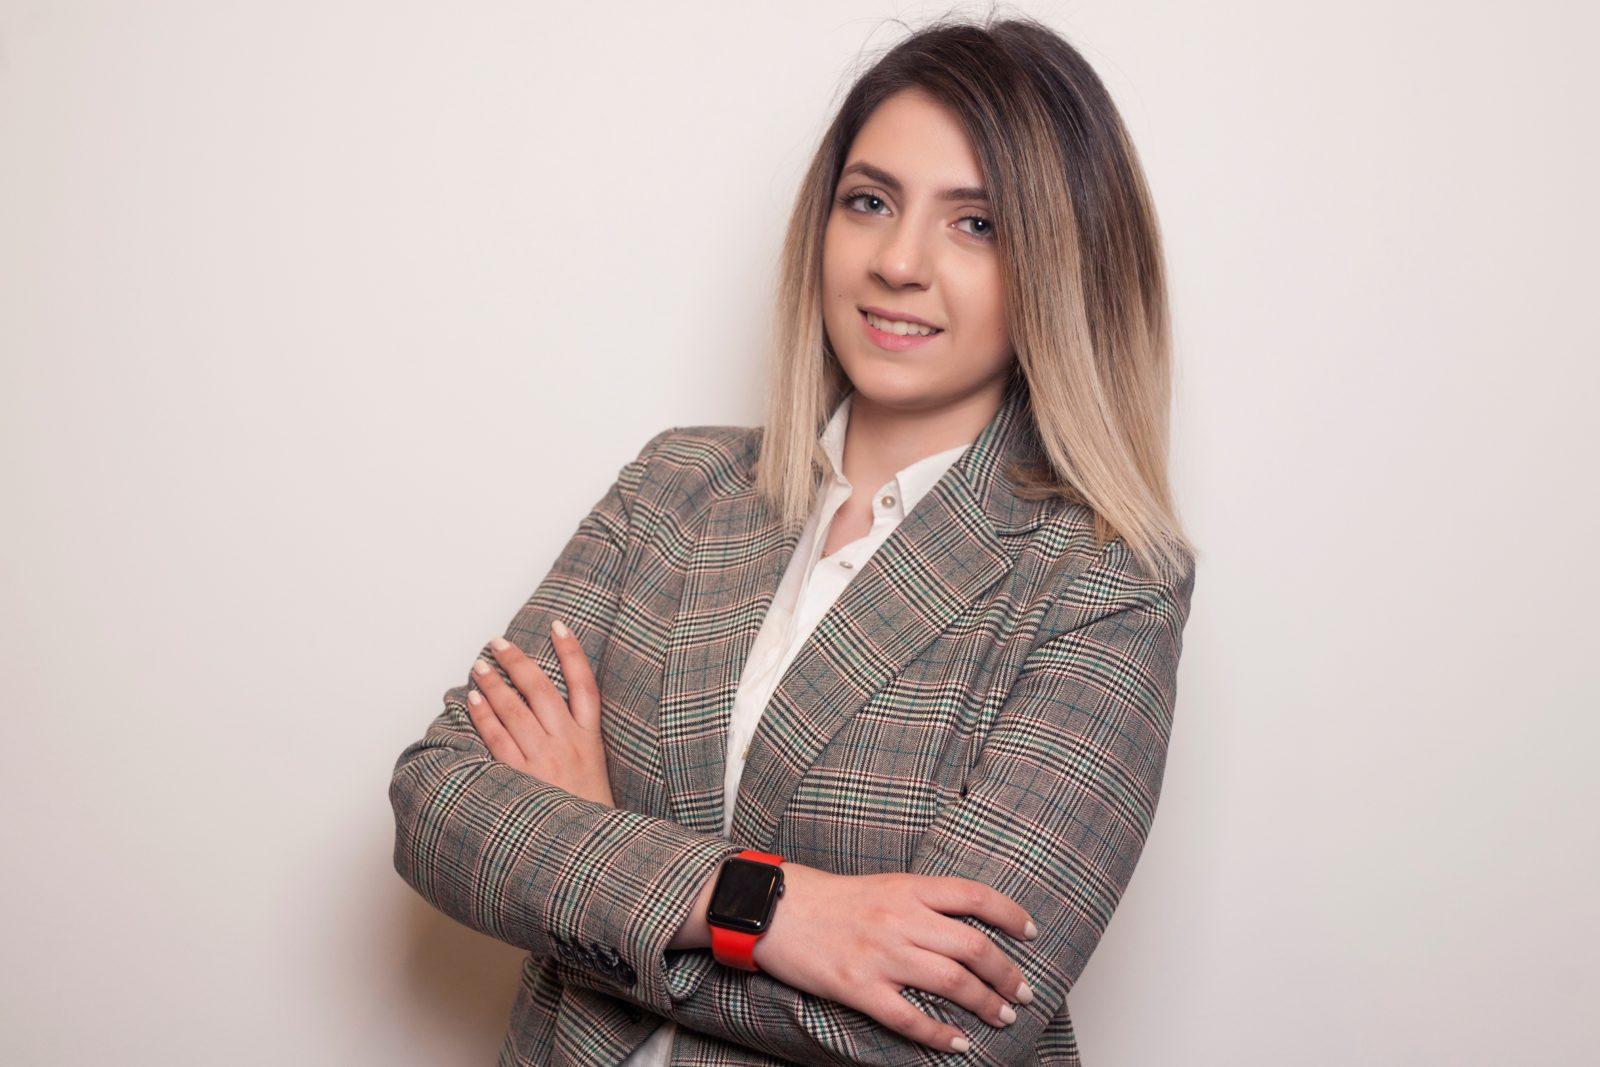 IDBank-ի մարքեթինգային գործունեությունը. Տաթևիկ Հովհաննիսյան